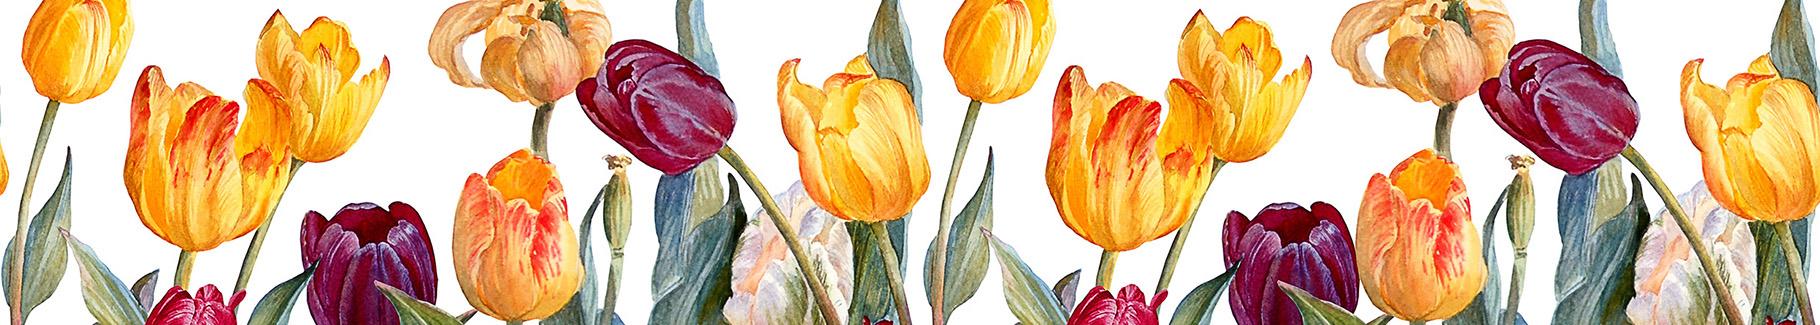 Kolorowa naklejka tulipany